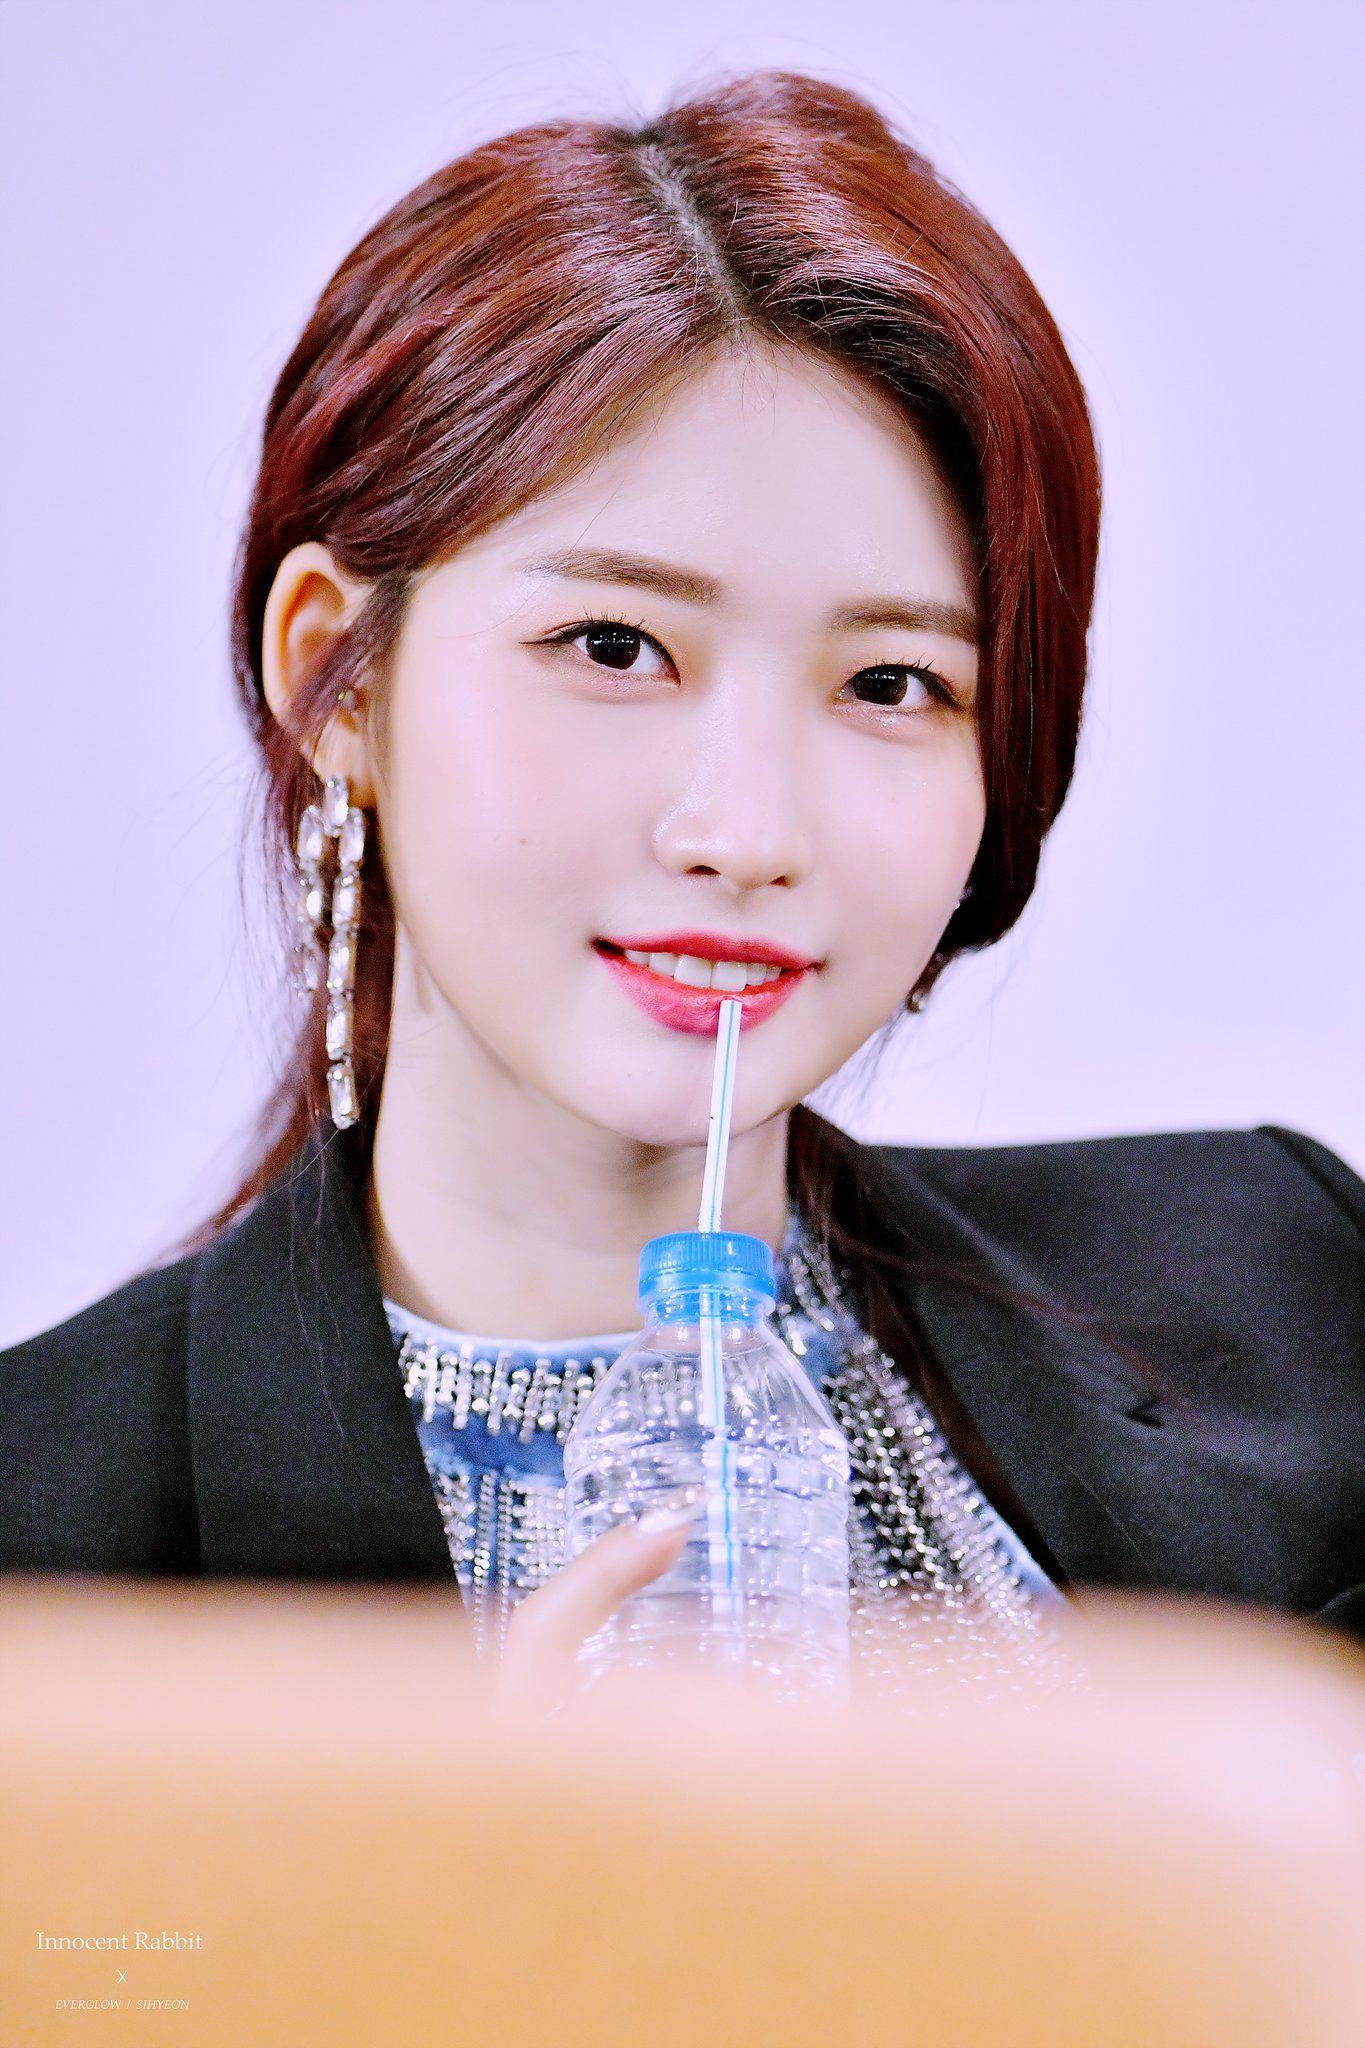 Innocent Rabbit On Twitter In 2020 Headshots Professional Kpop Kim